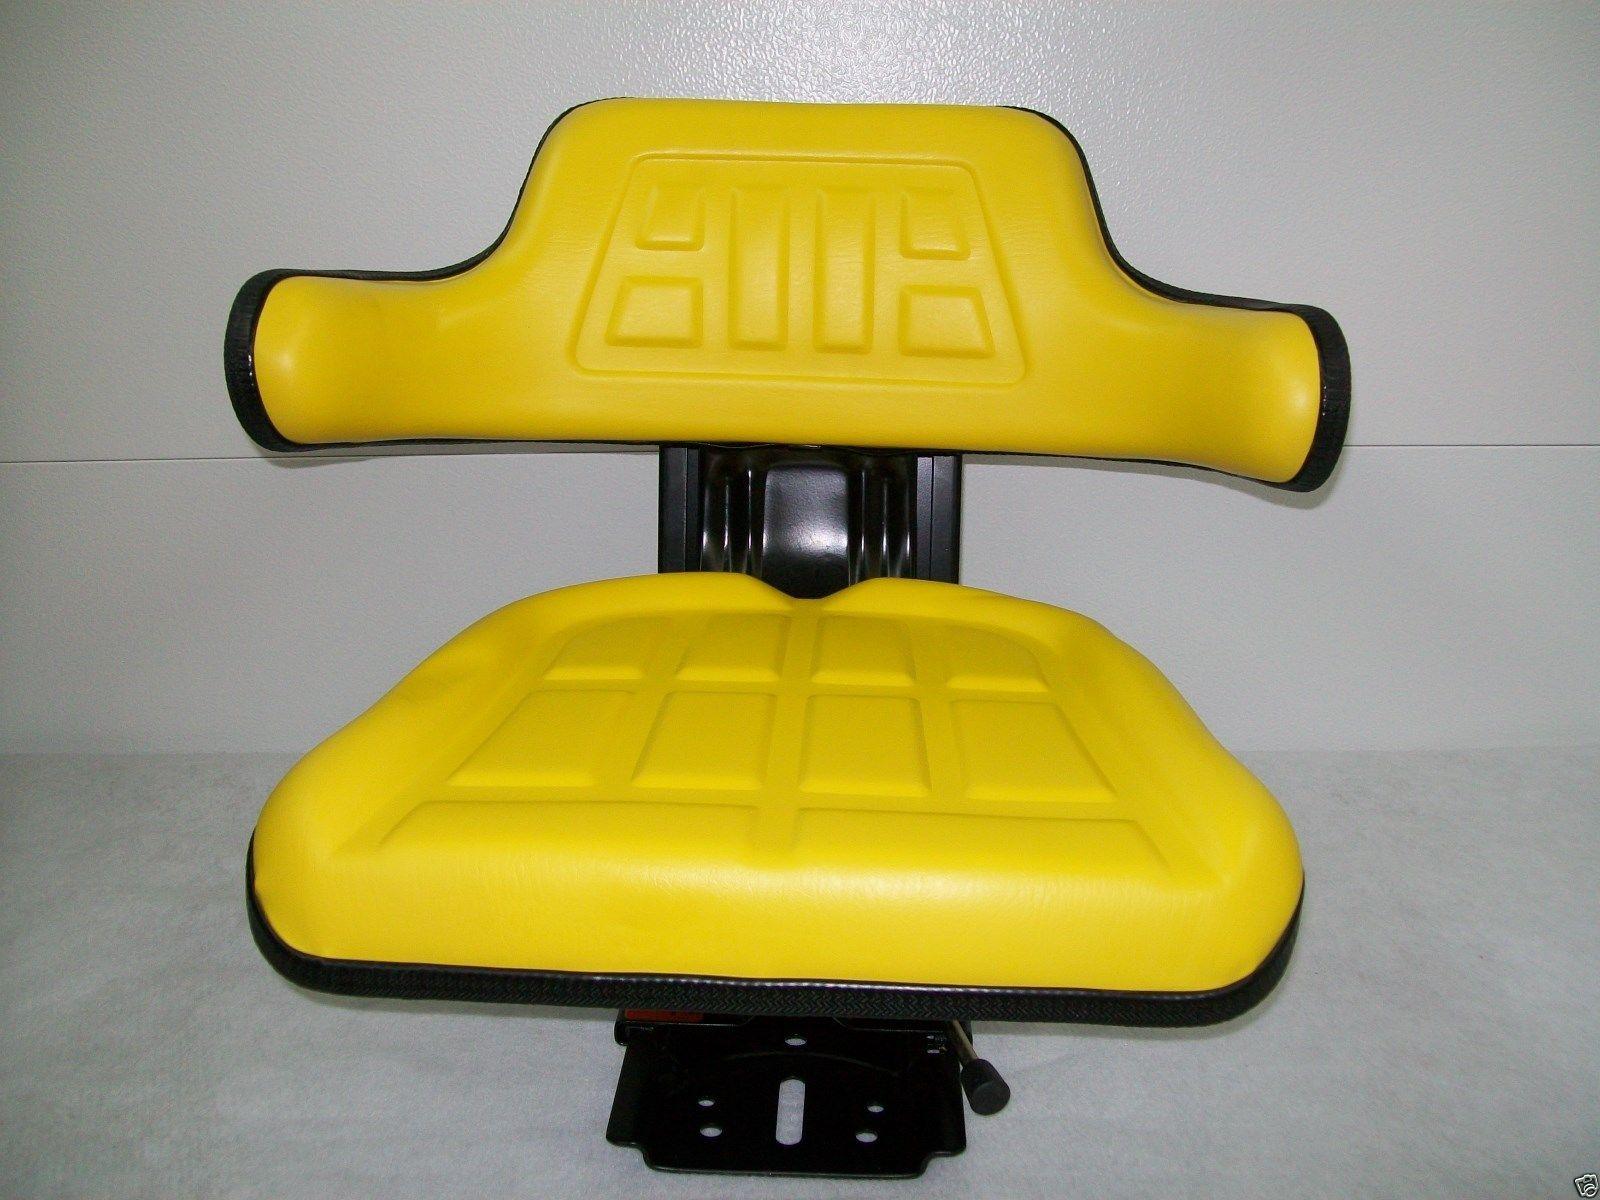 Suspension Seat John Deere Tractor Yellow 1020 1530 2020 2030 Wiring Diagram 2040 2150 Ie